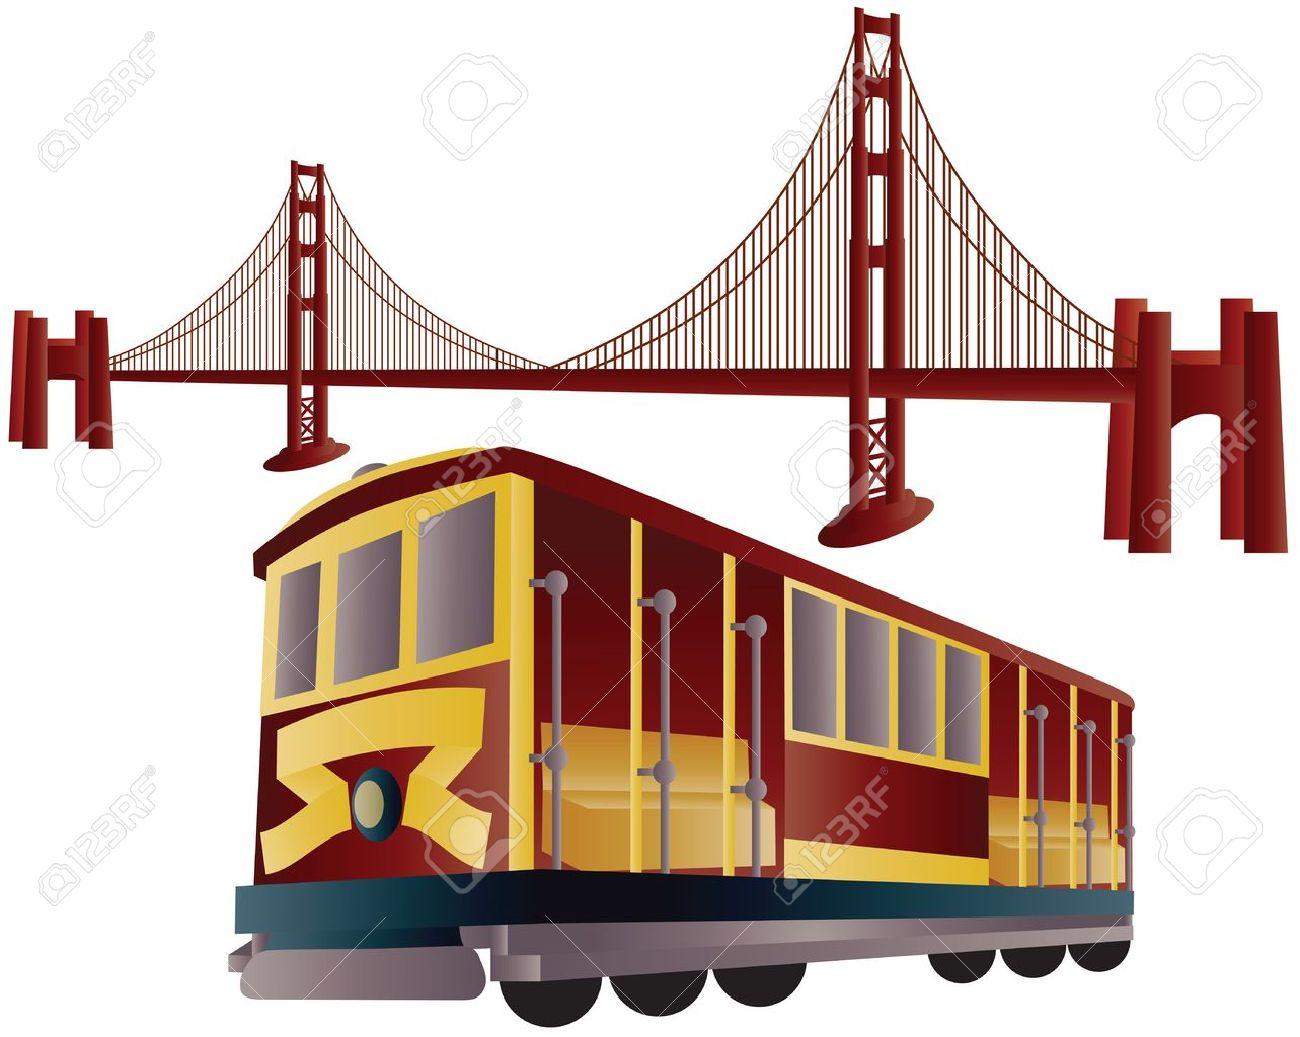 San Francisco Cable Car Trolley and Golden Gate Bridge Illustration - 13370032